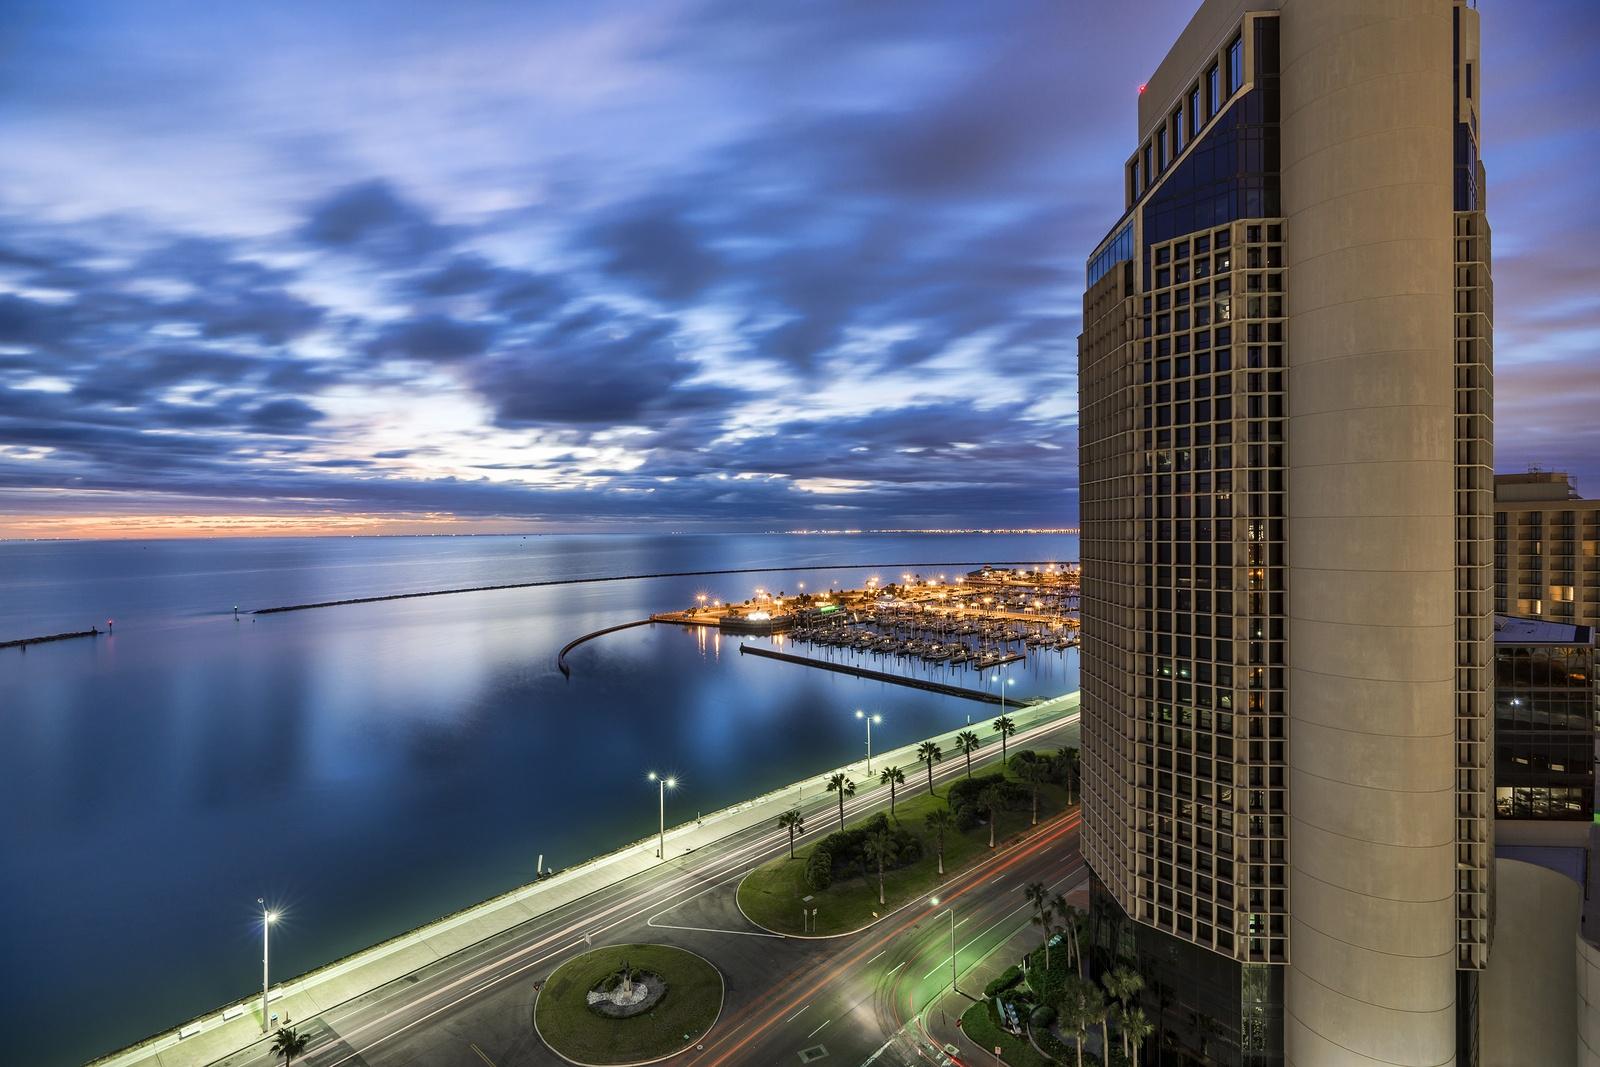 bigstock-Corpus-Christi-Waterfront-72528013.jpg